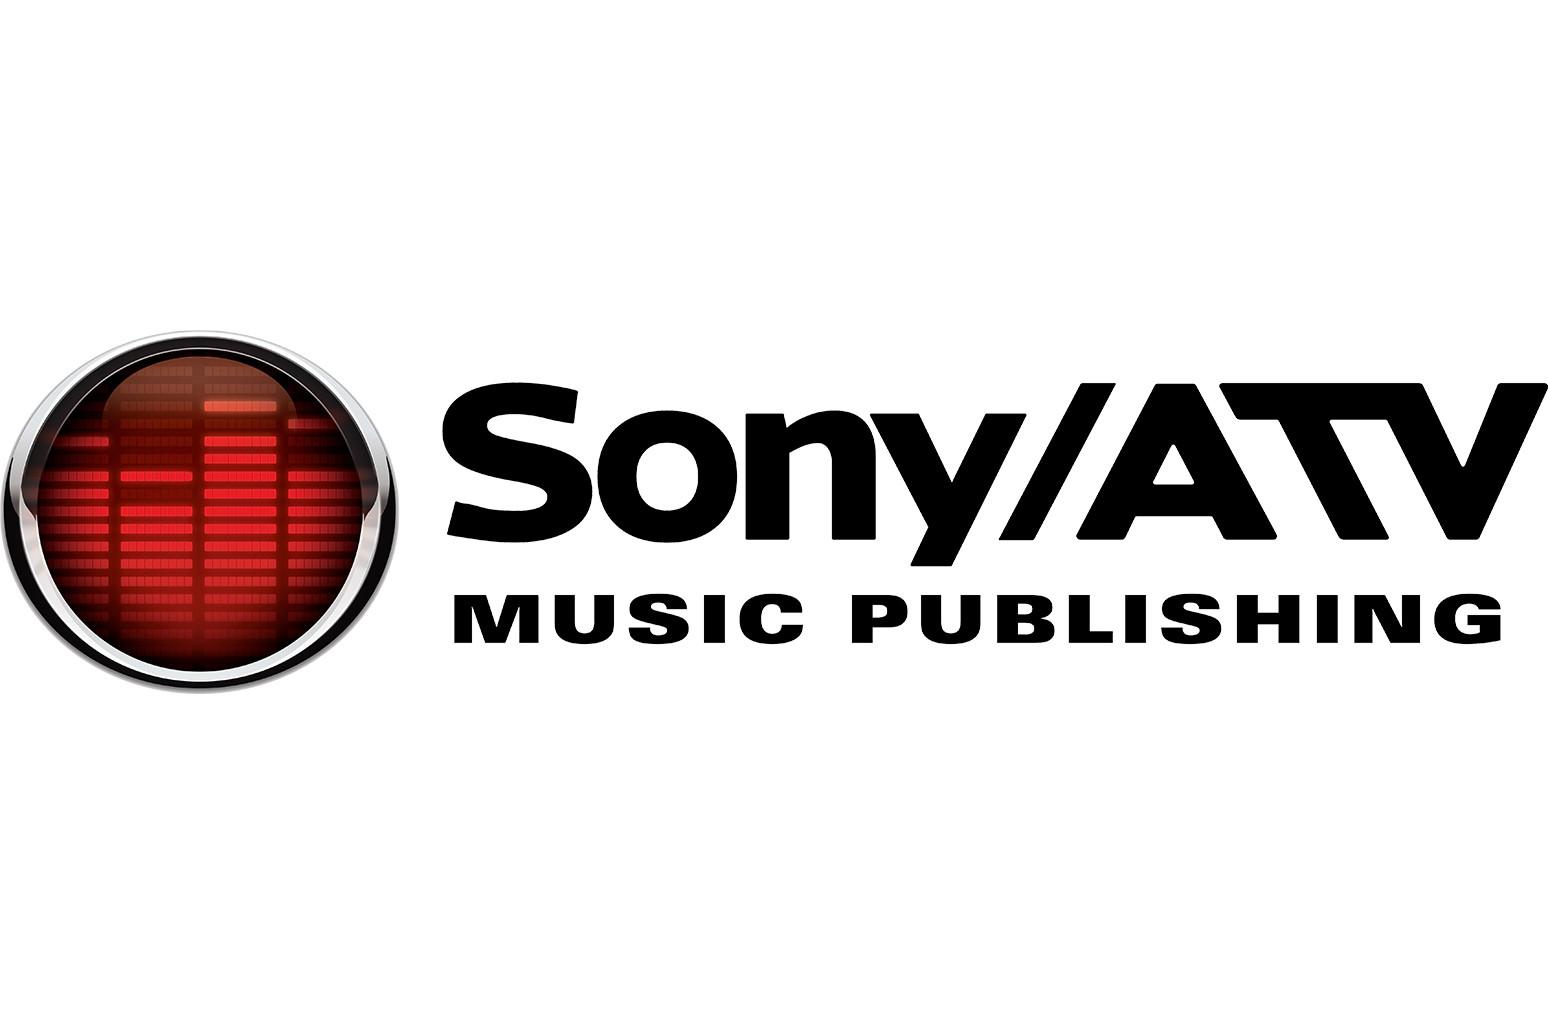 Sony/ATV Music Publishing Logo